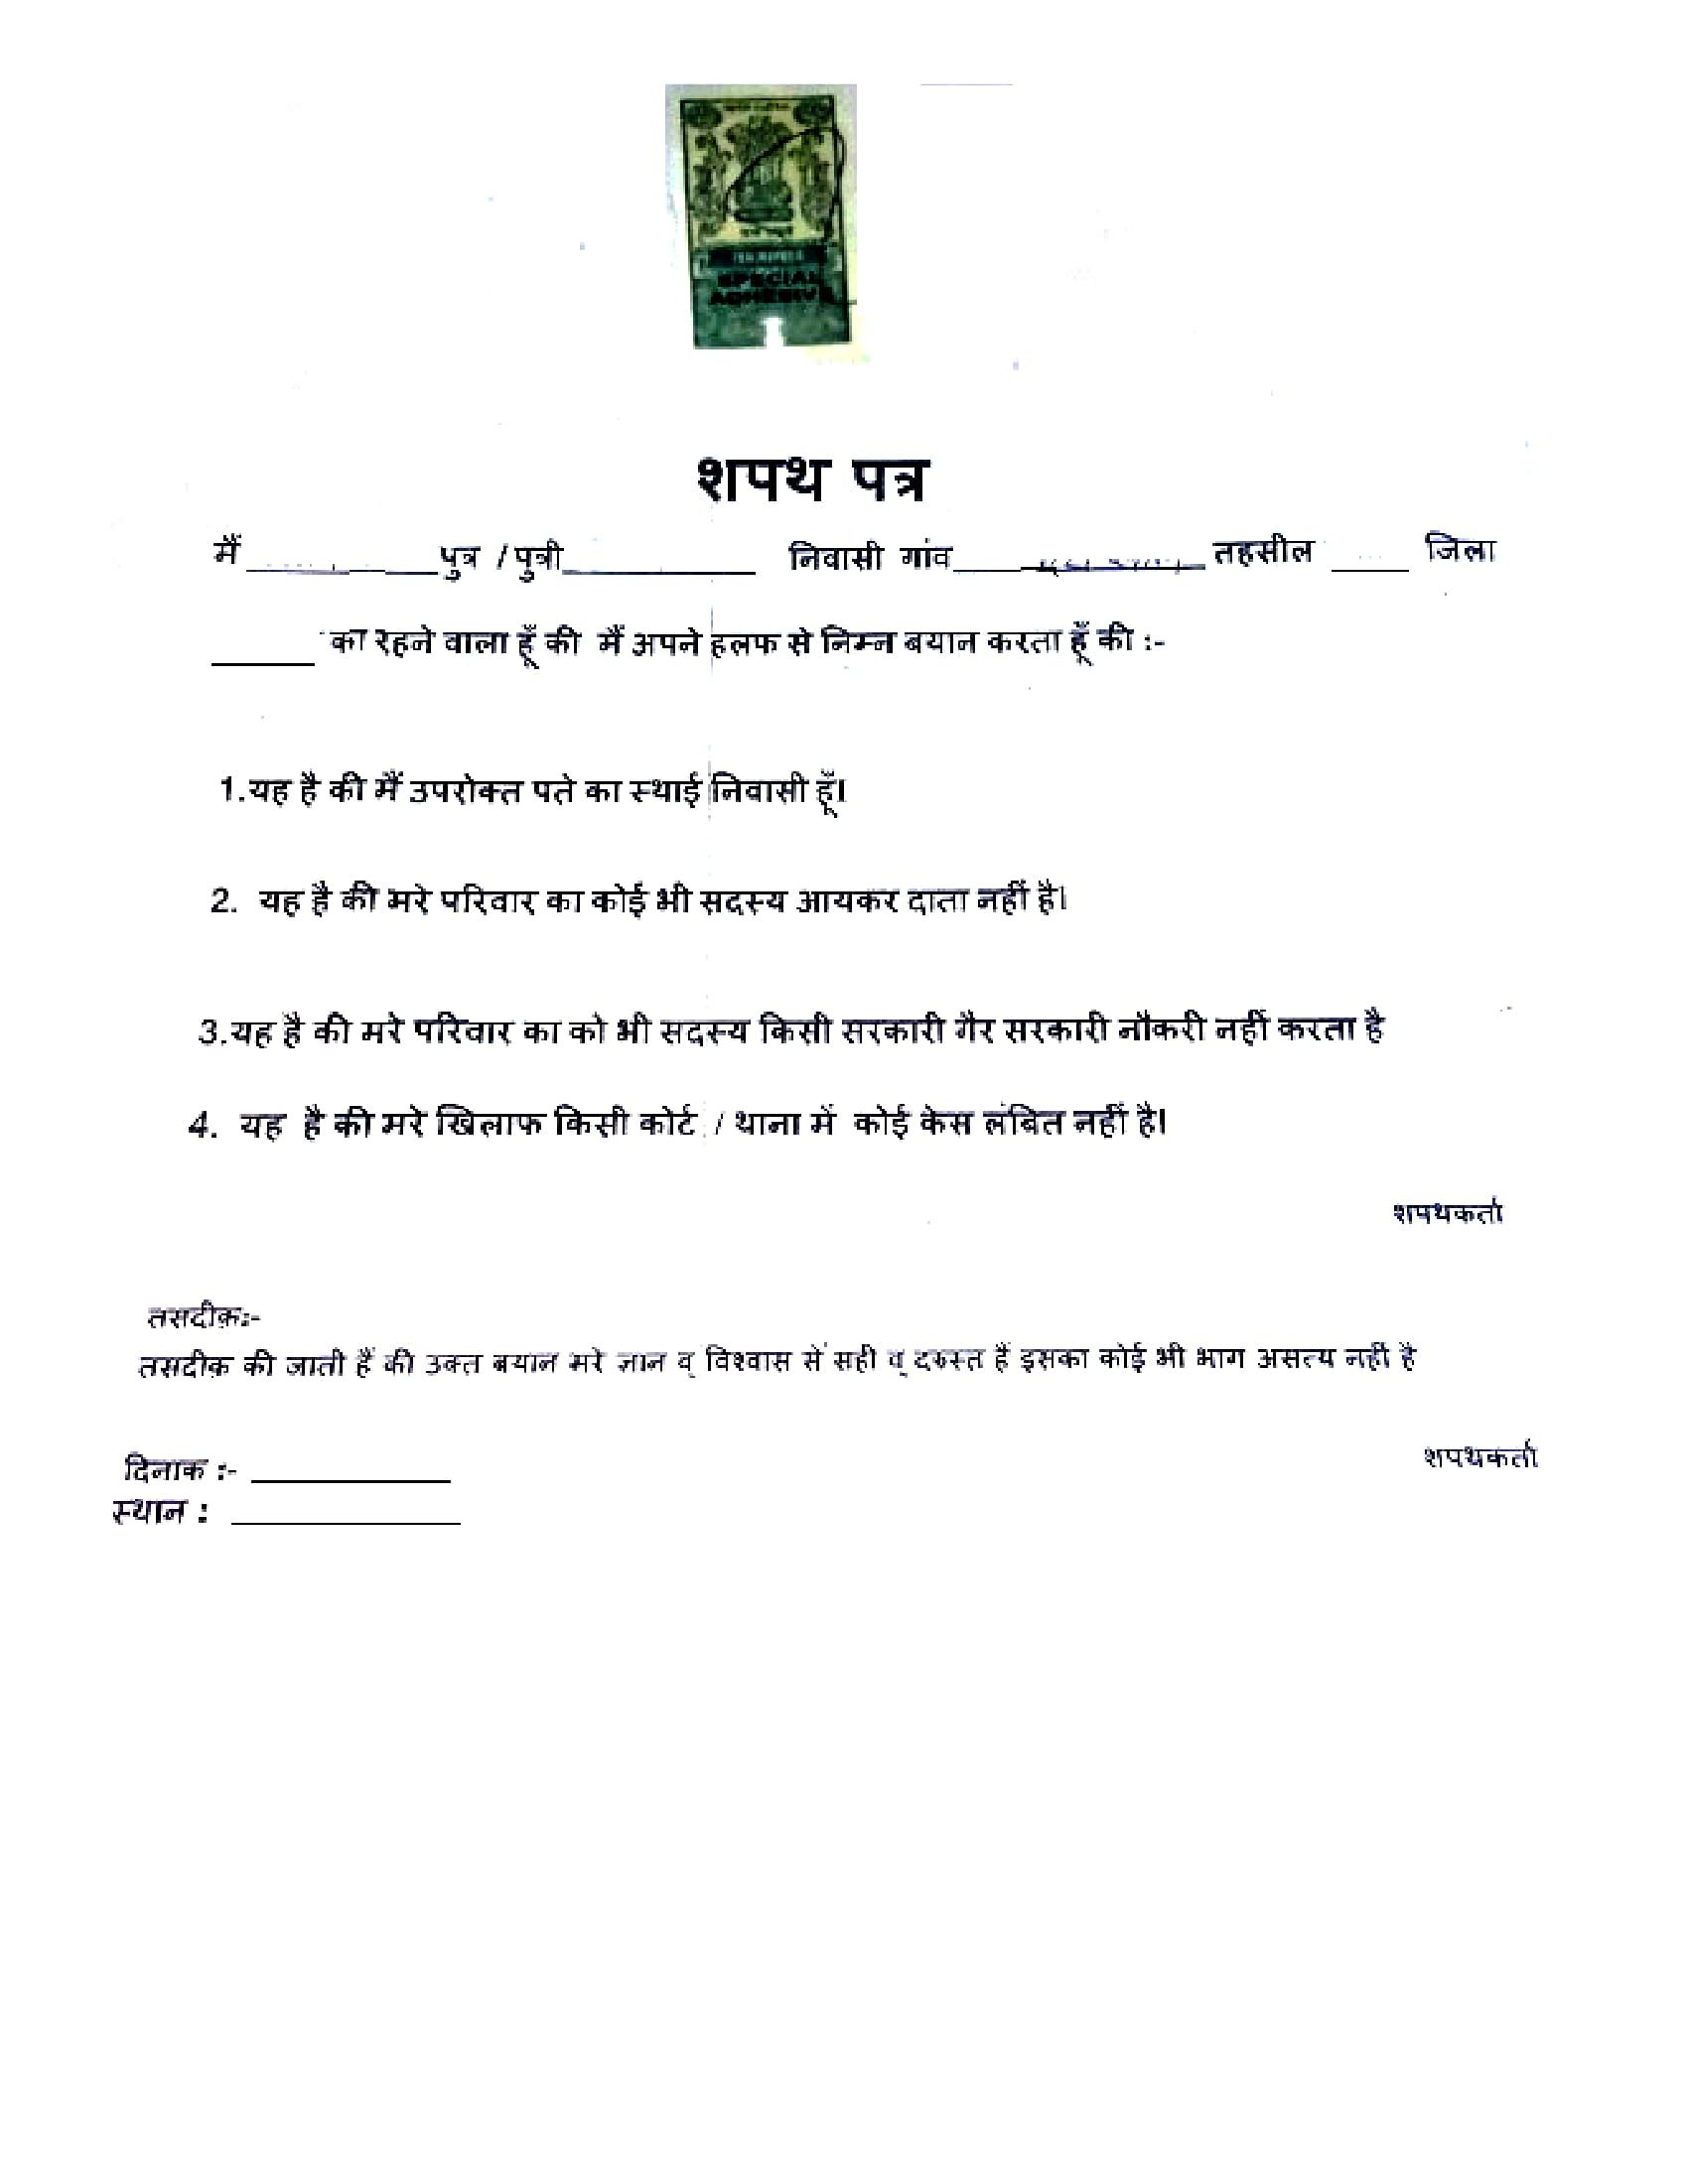 HSSC Group D Selfattested declaration Form for Non Govt